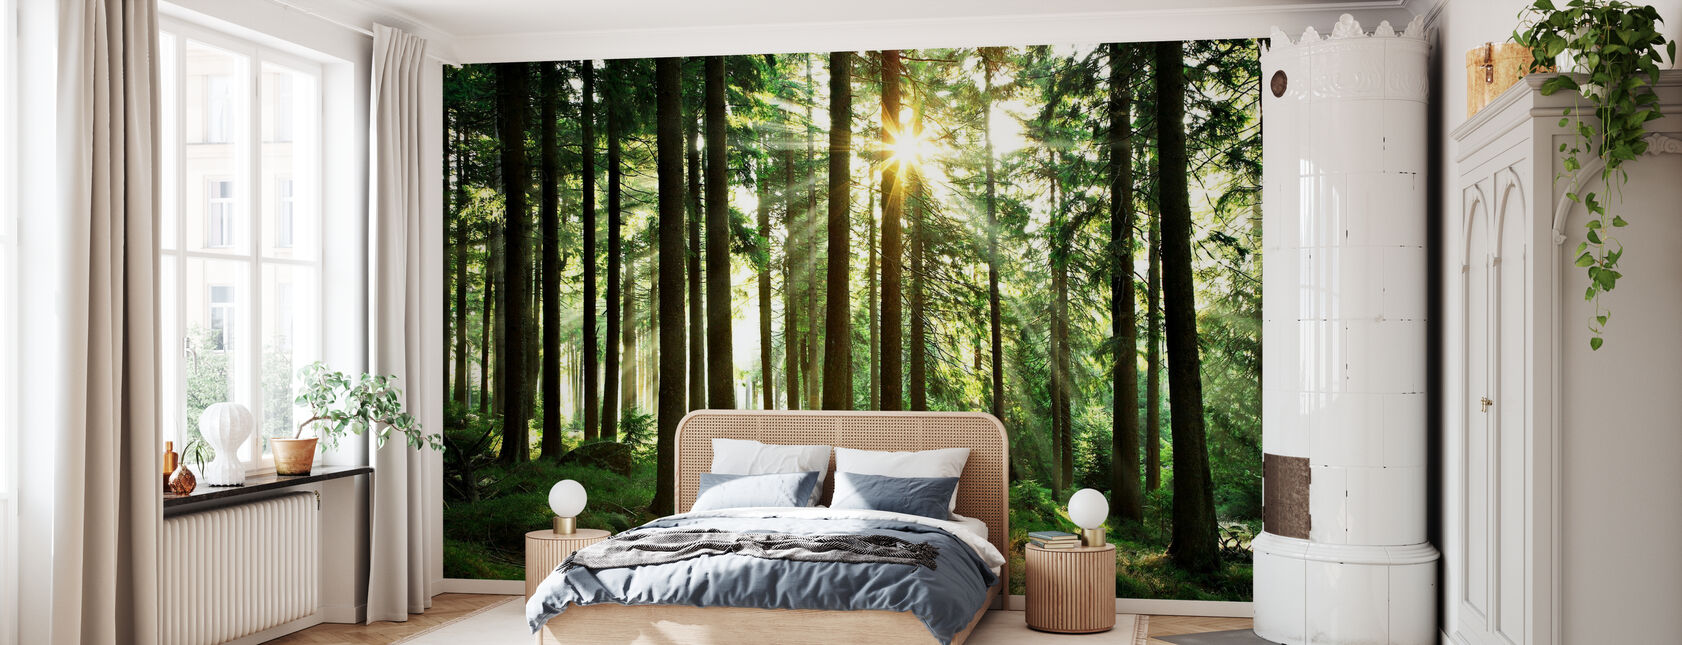 Solstråle genom träd - Tapet - Sovrum